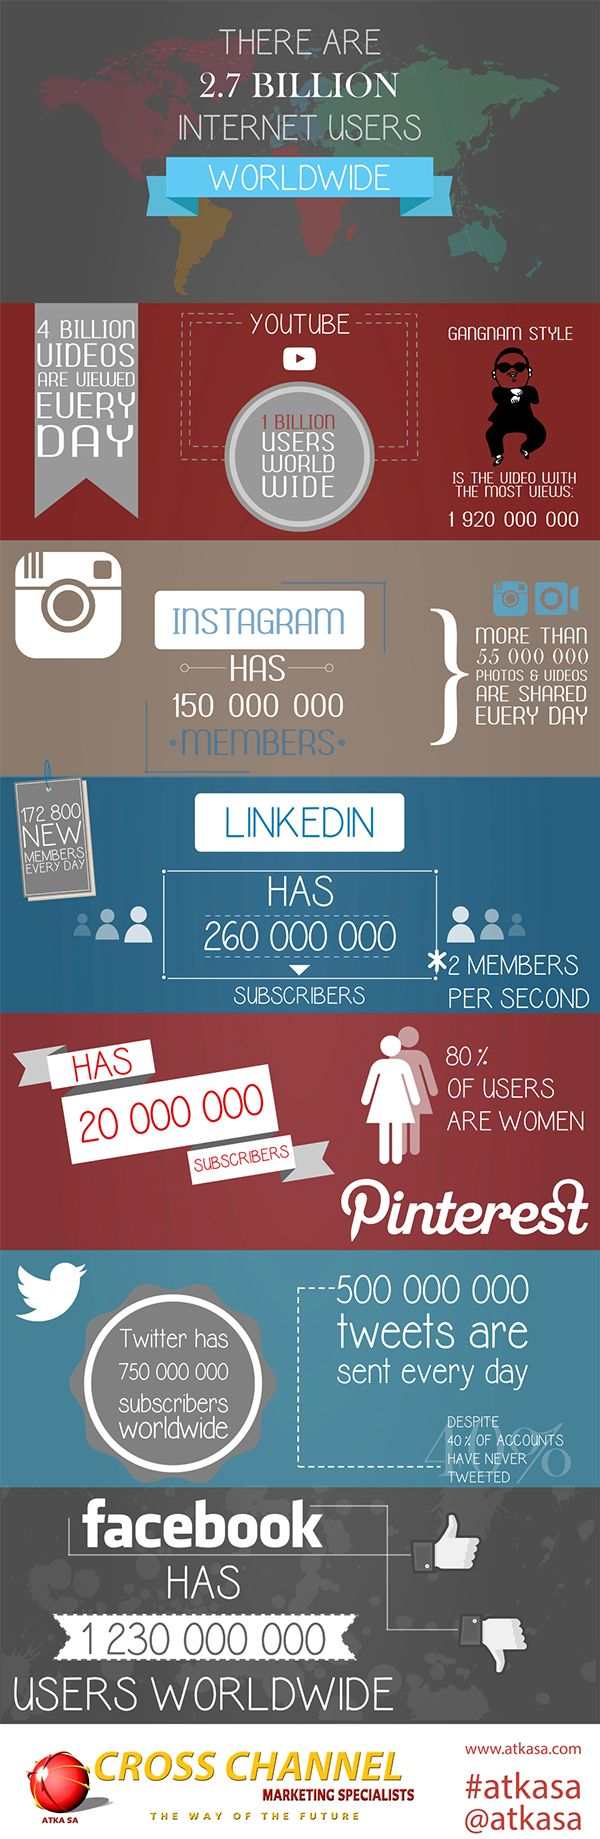 #SMDAY Infographic by Karine Taljaard, via Behance